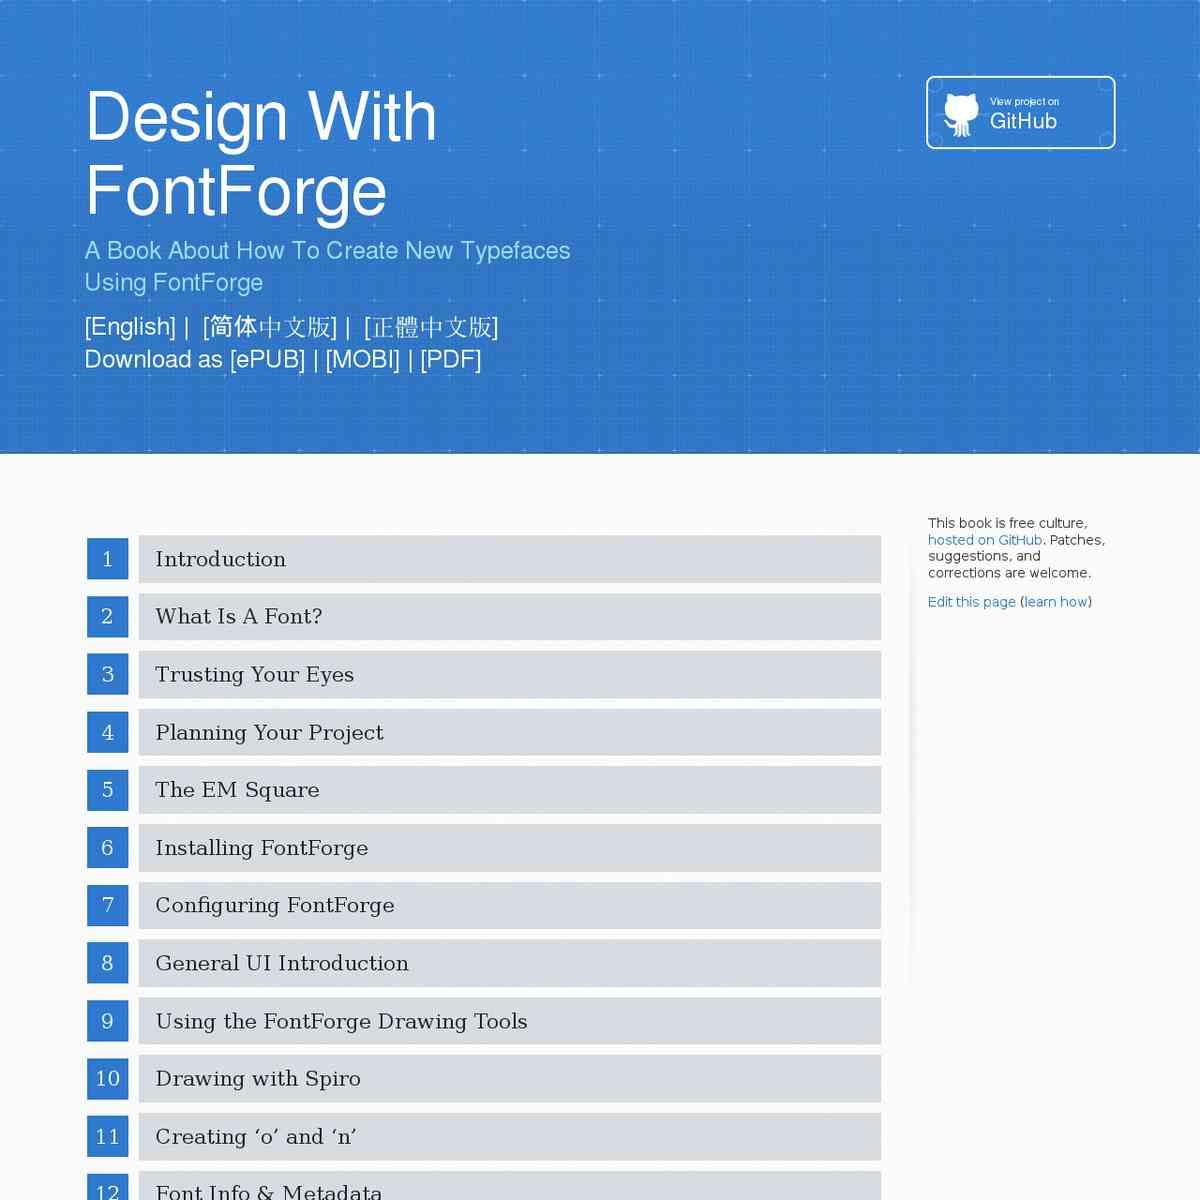 Design With FontForge